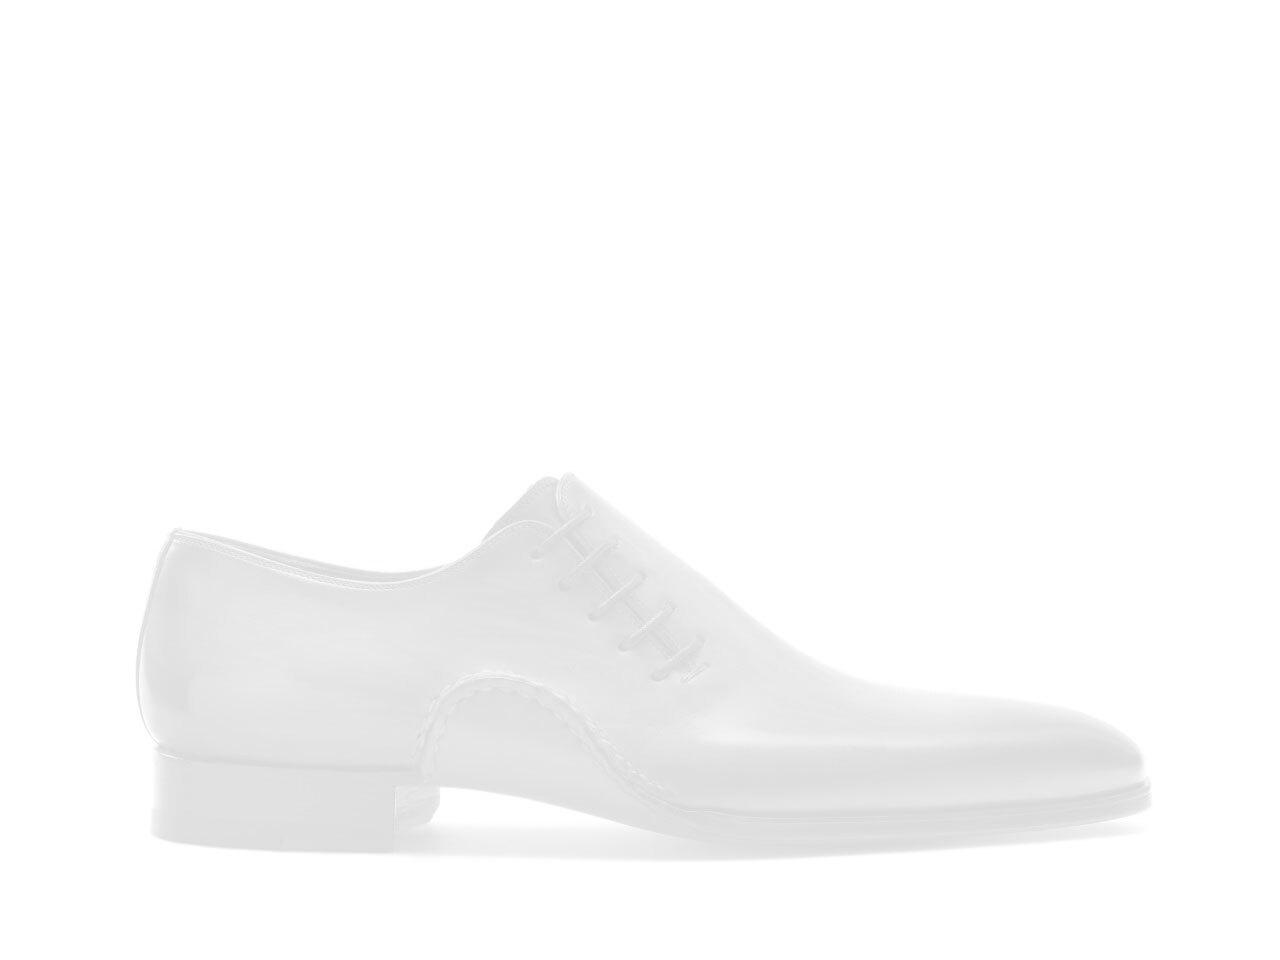 Sole of the Magnanni Pueblo Cognac Men's Sneakers